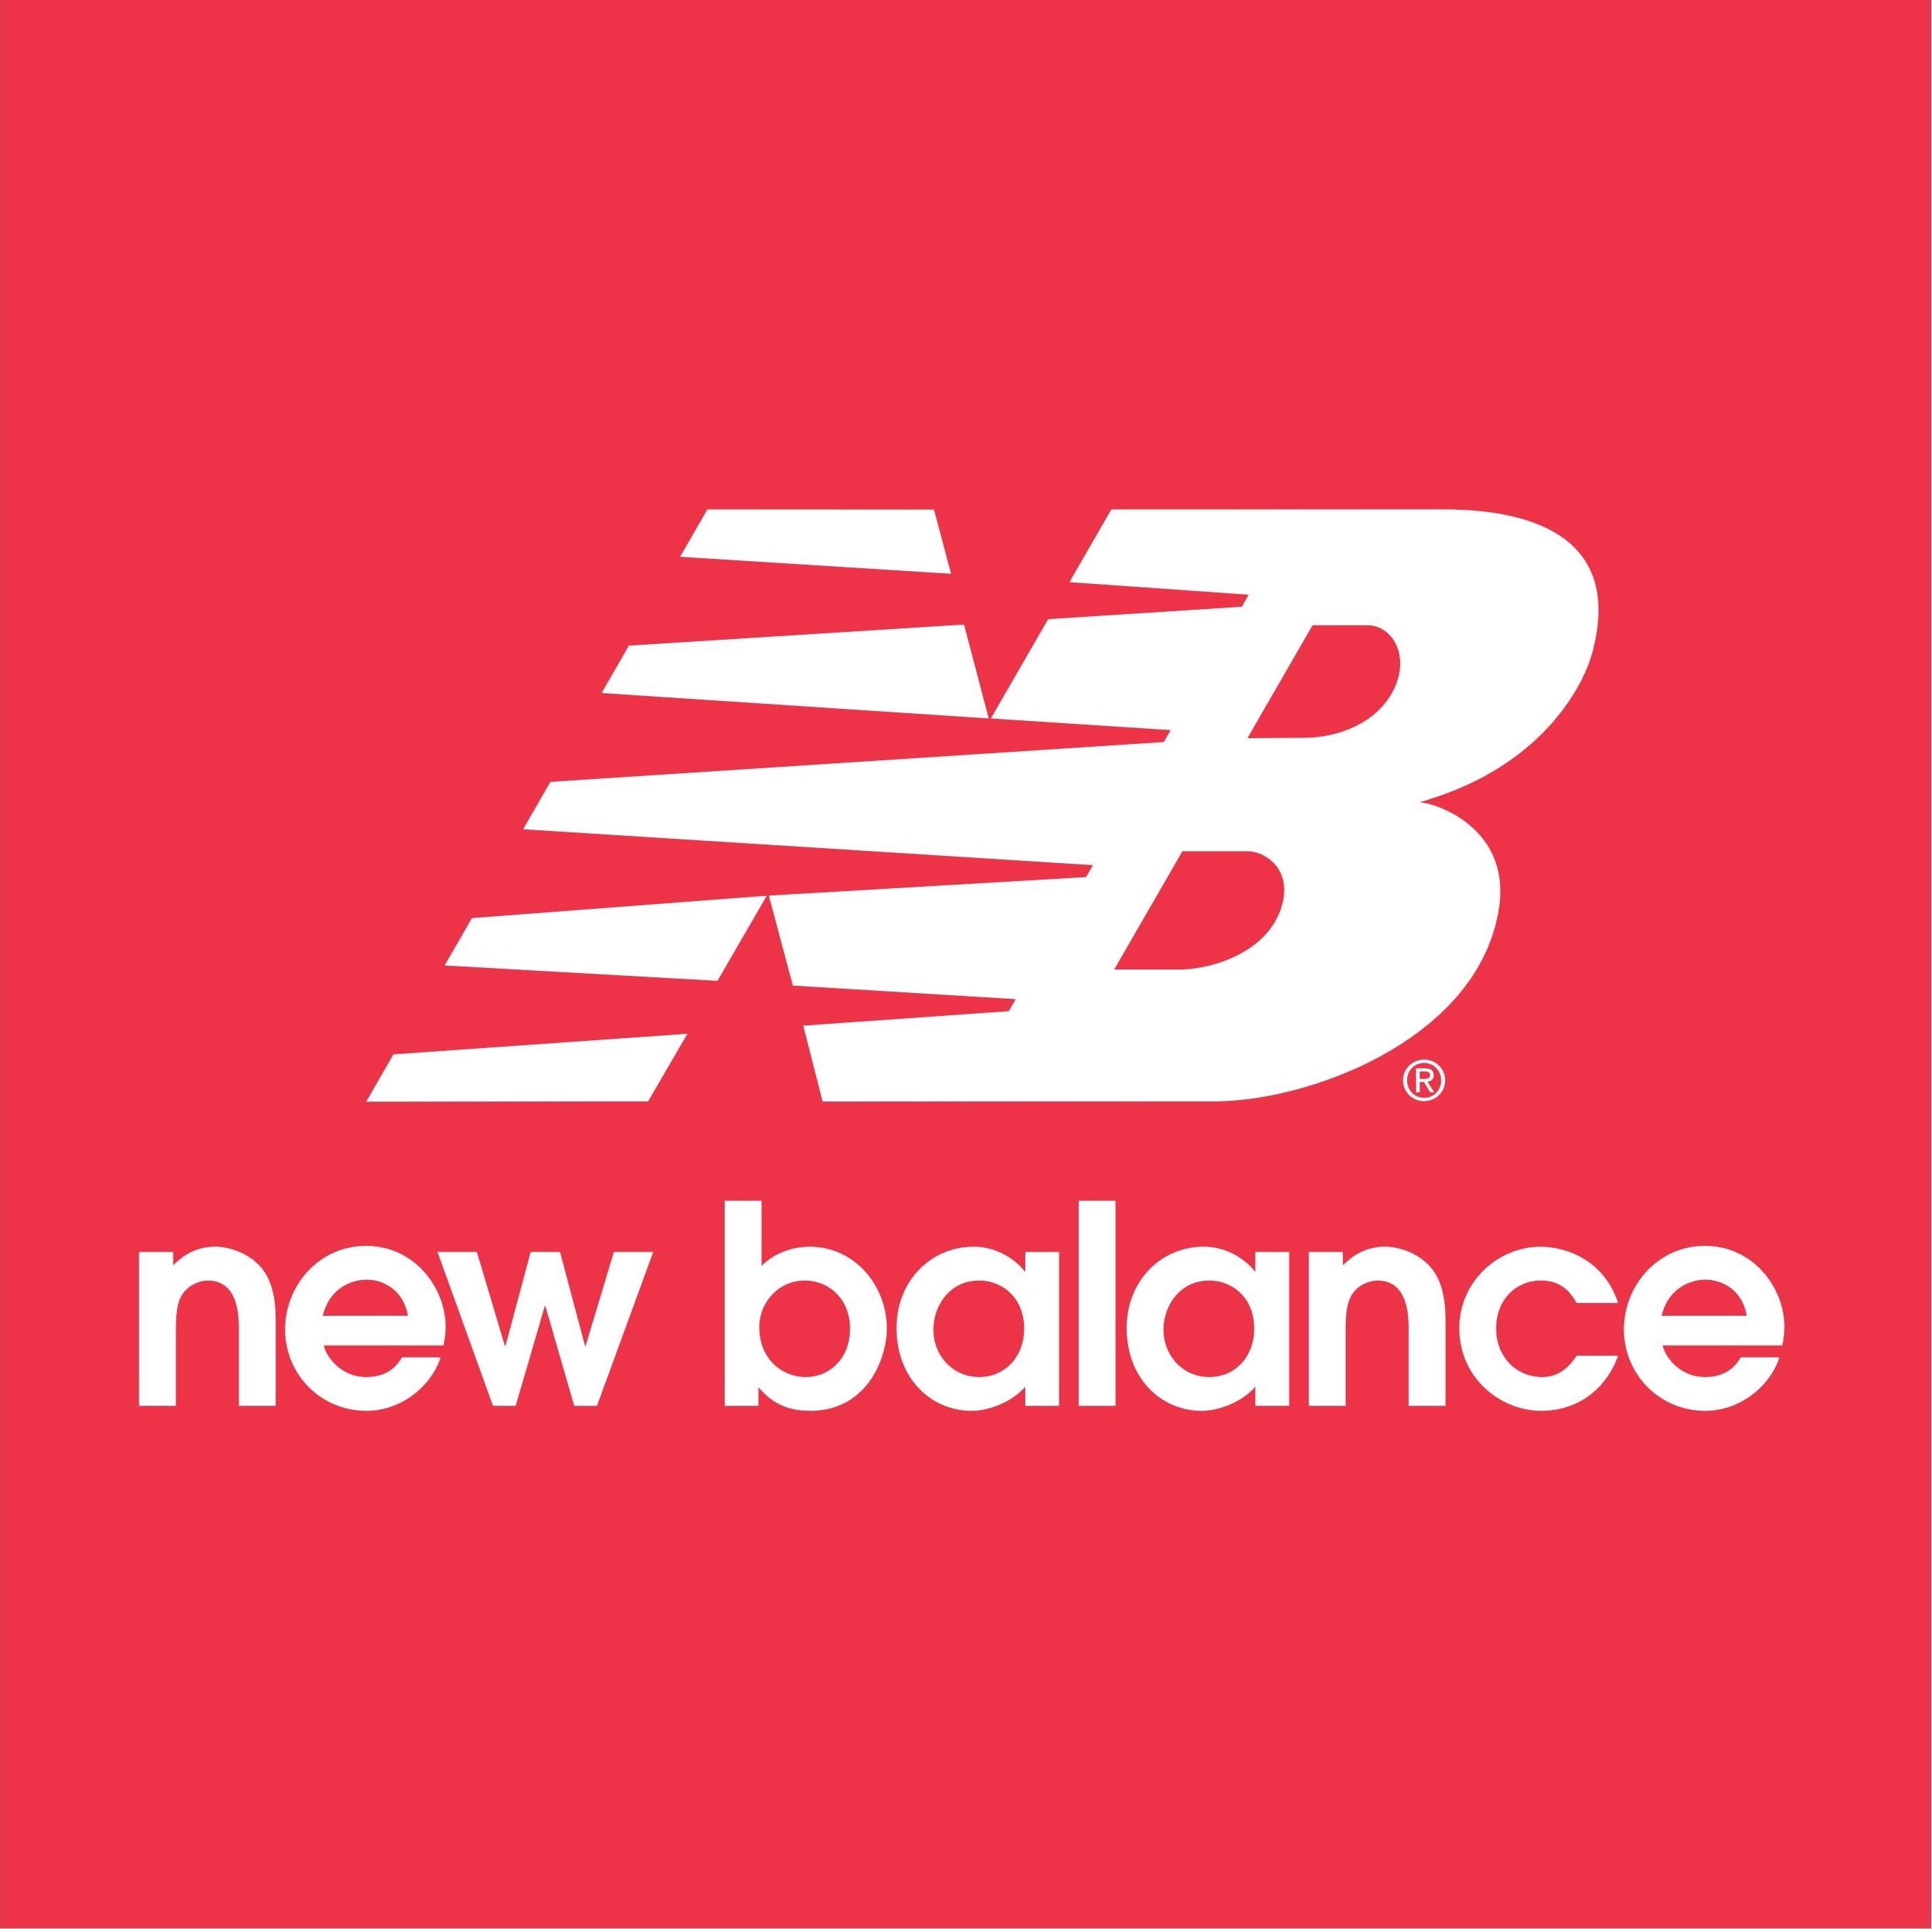 new balance shoe company